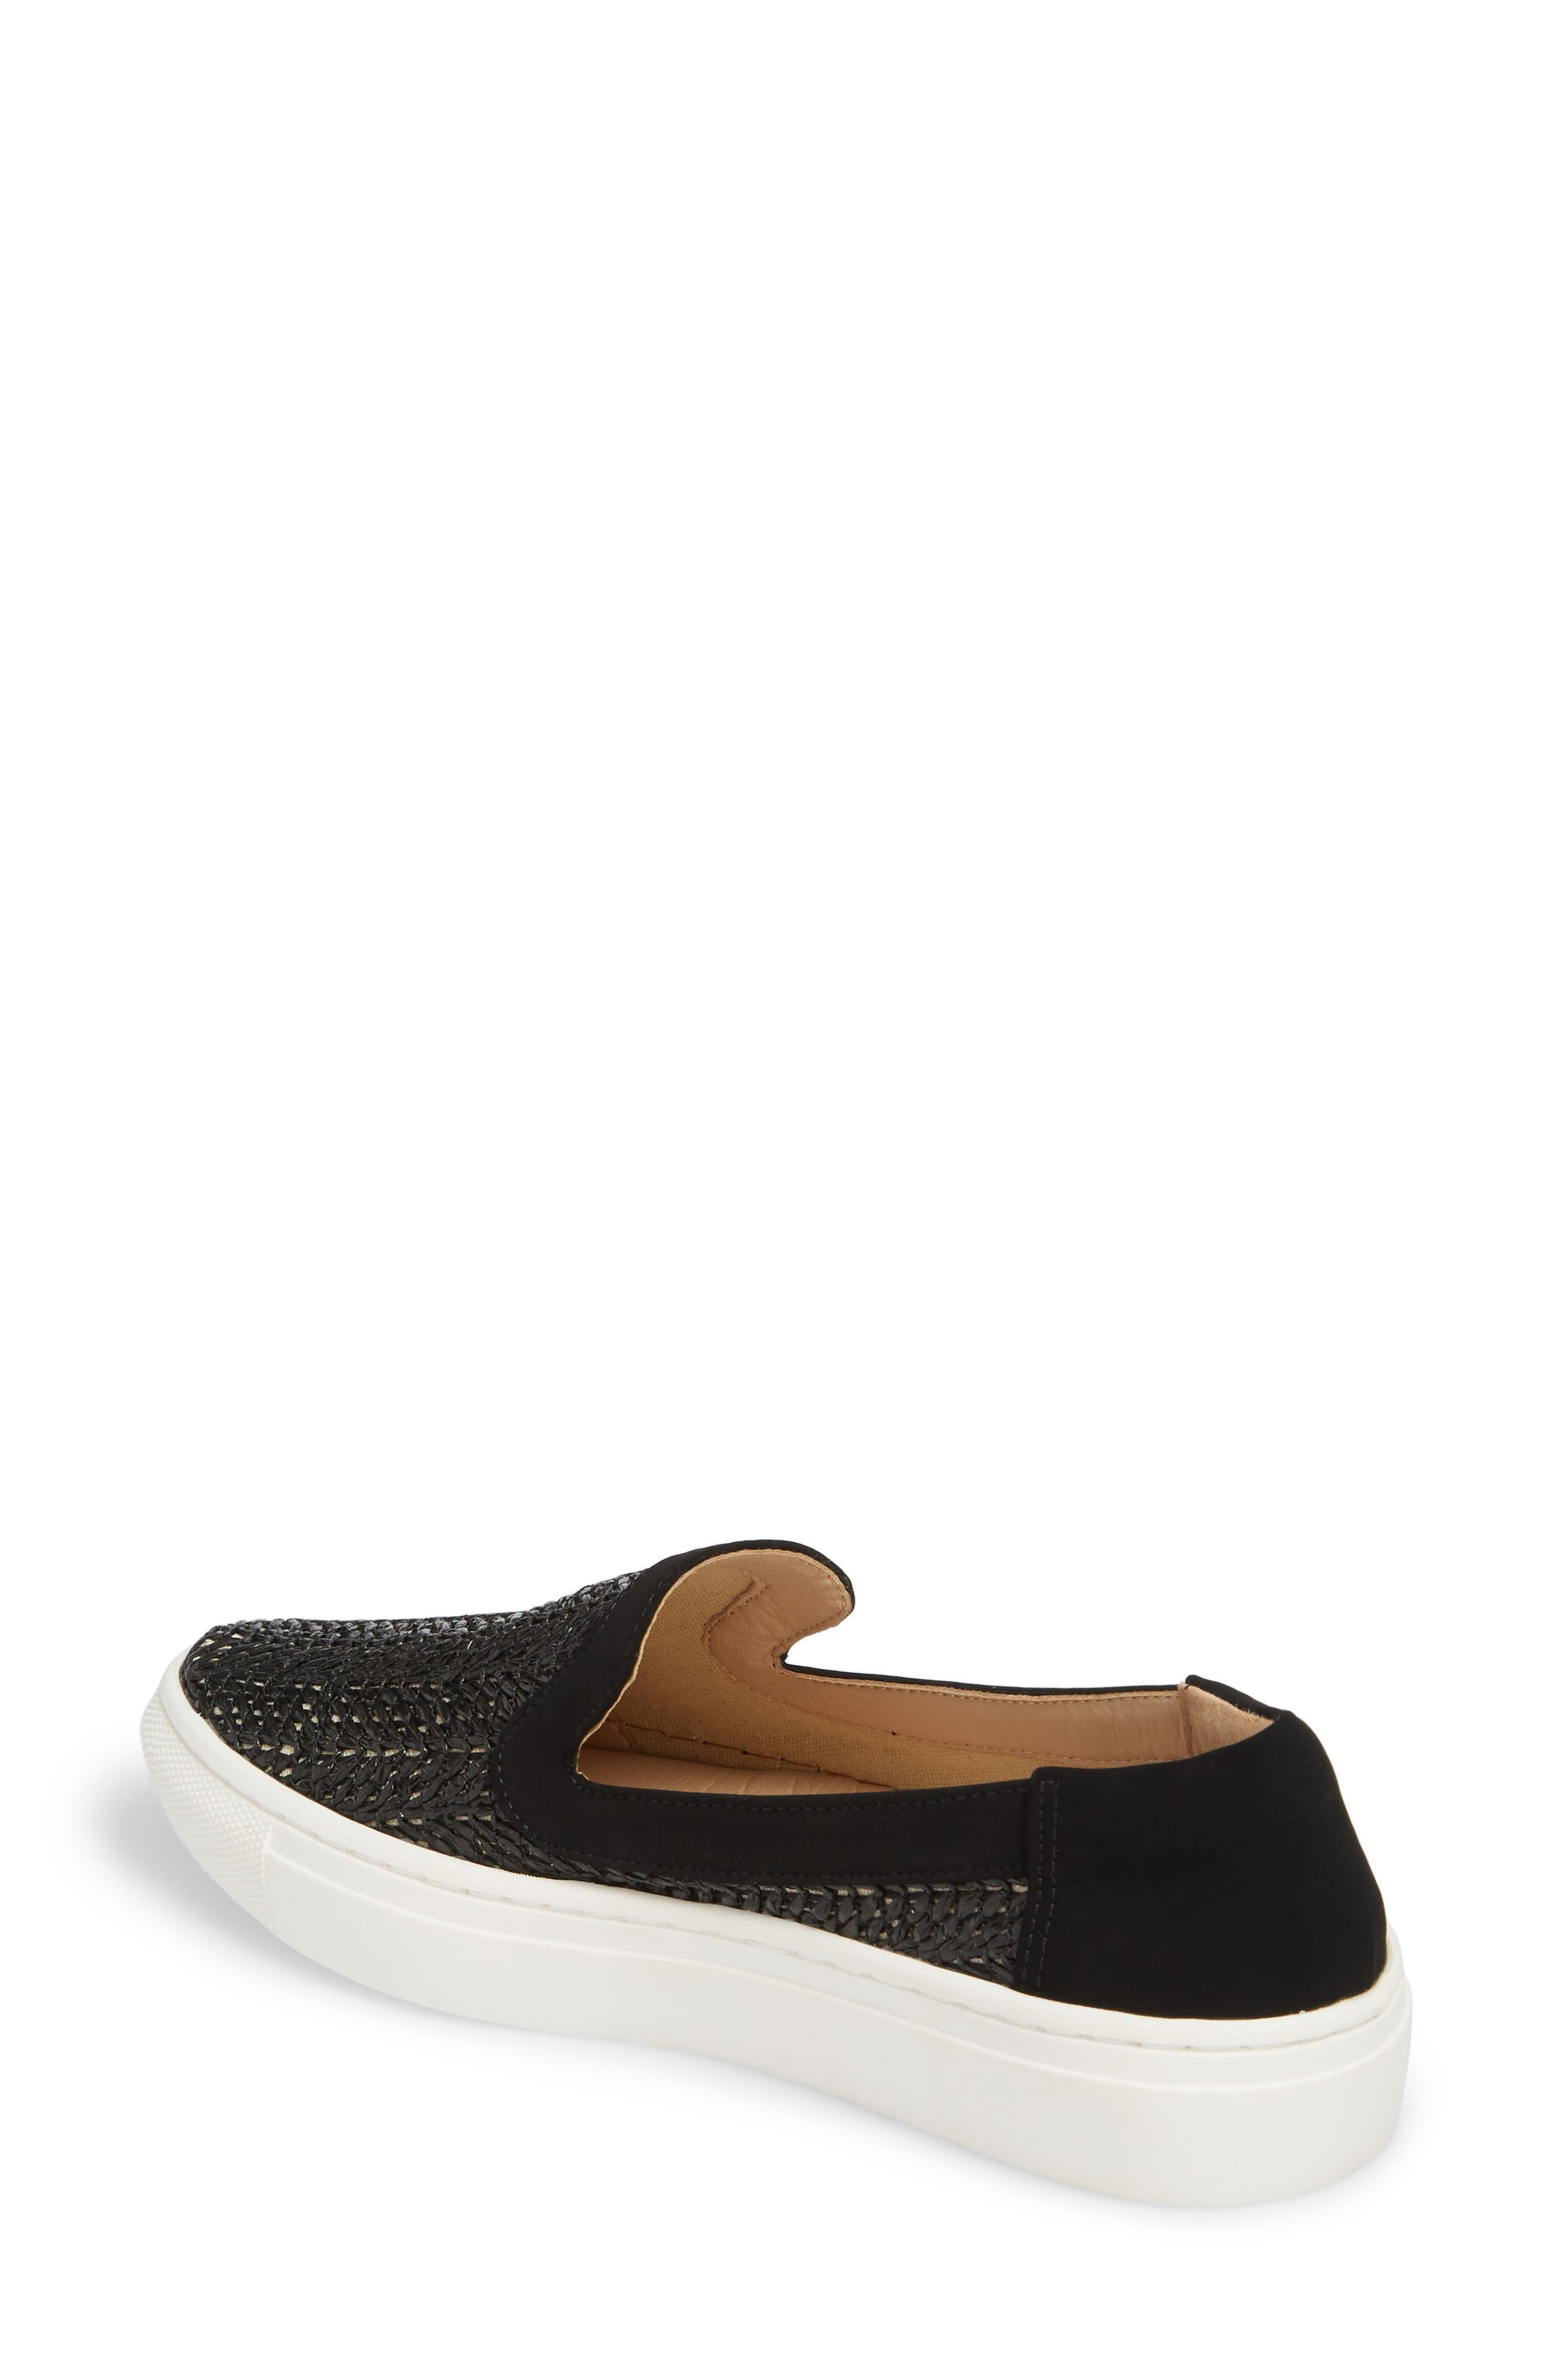 Lineth Sneaker,                             Alternate thumbnail 2, color,                             001